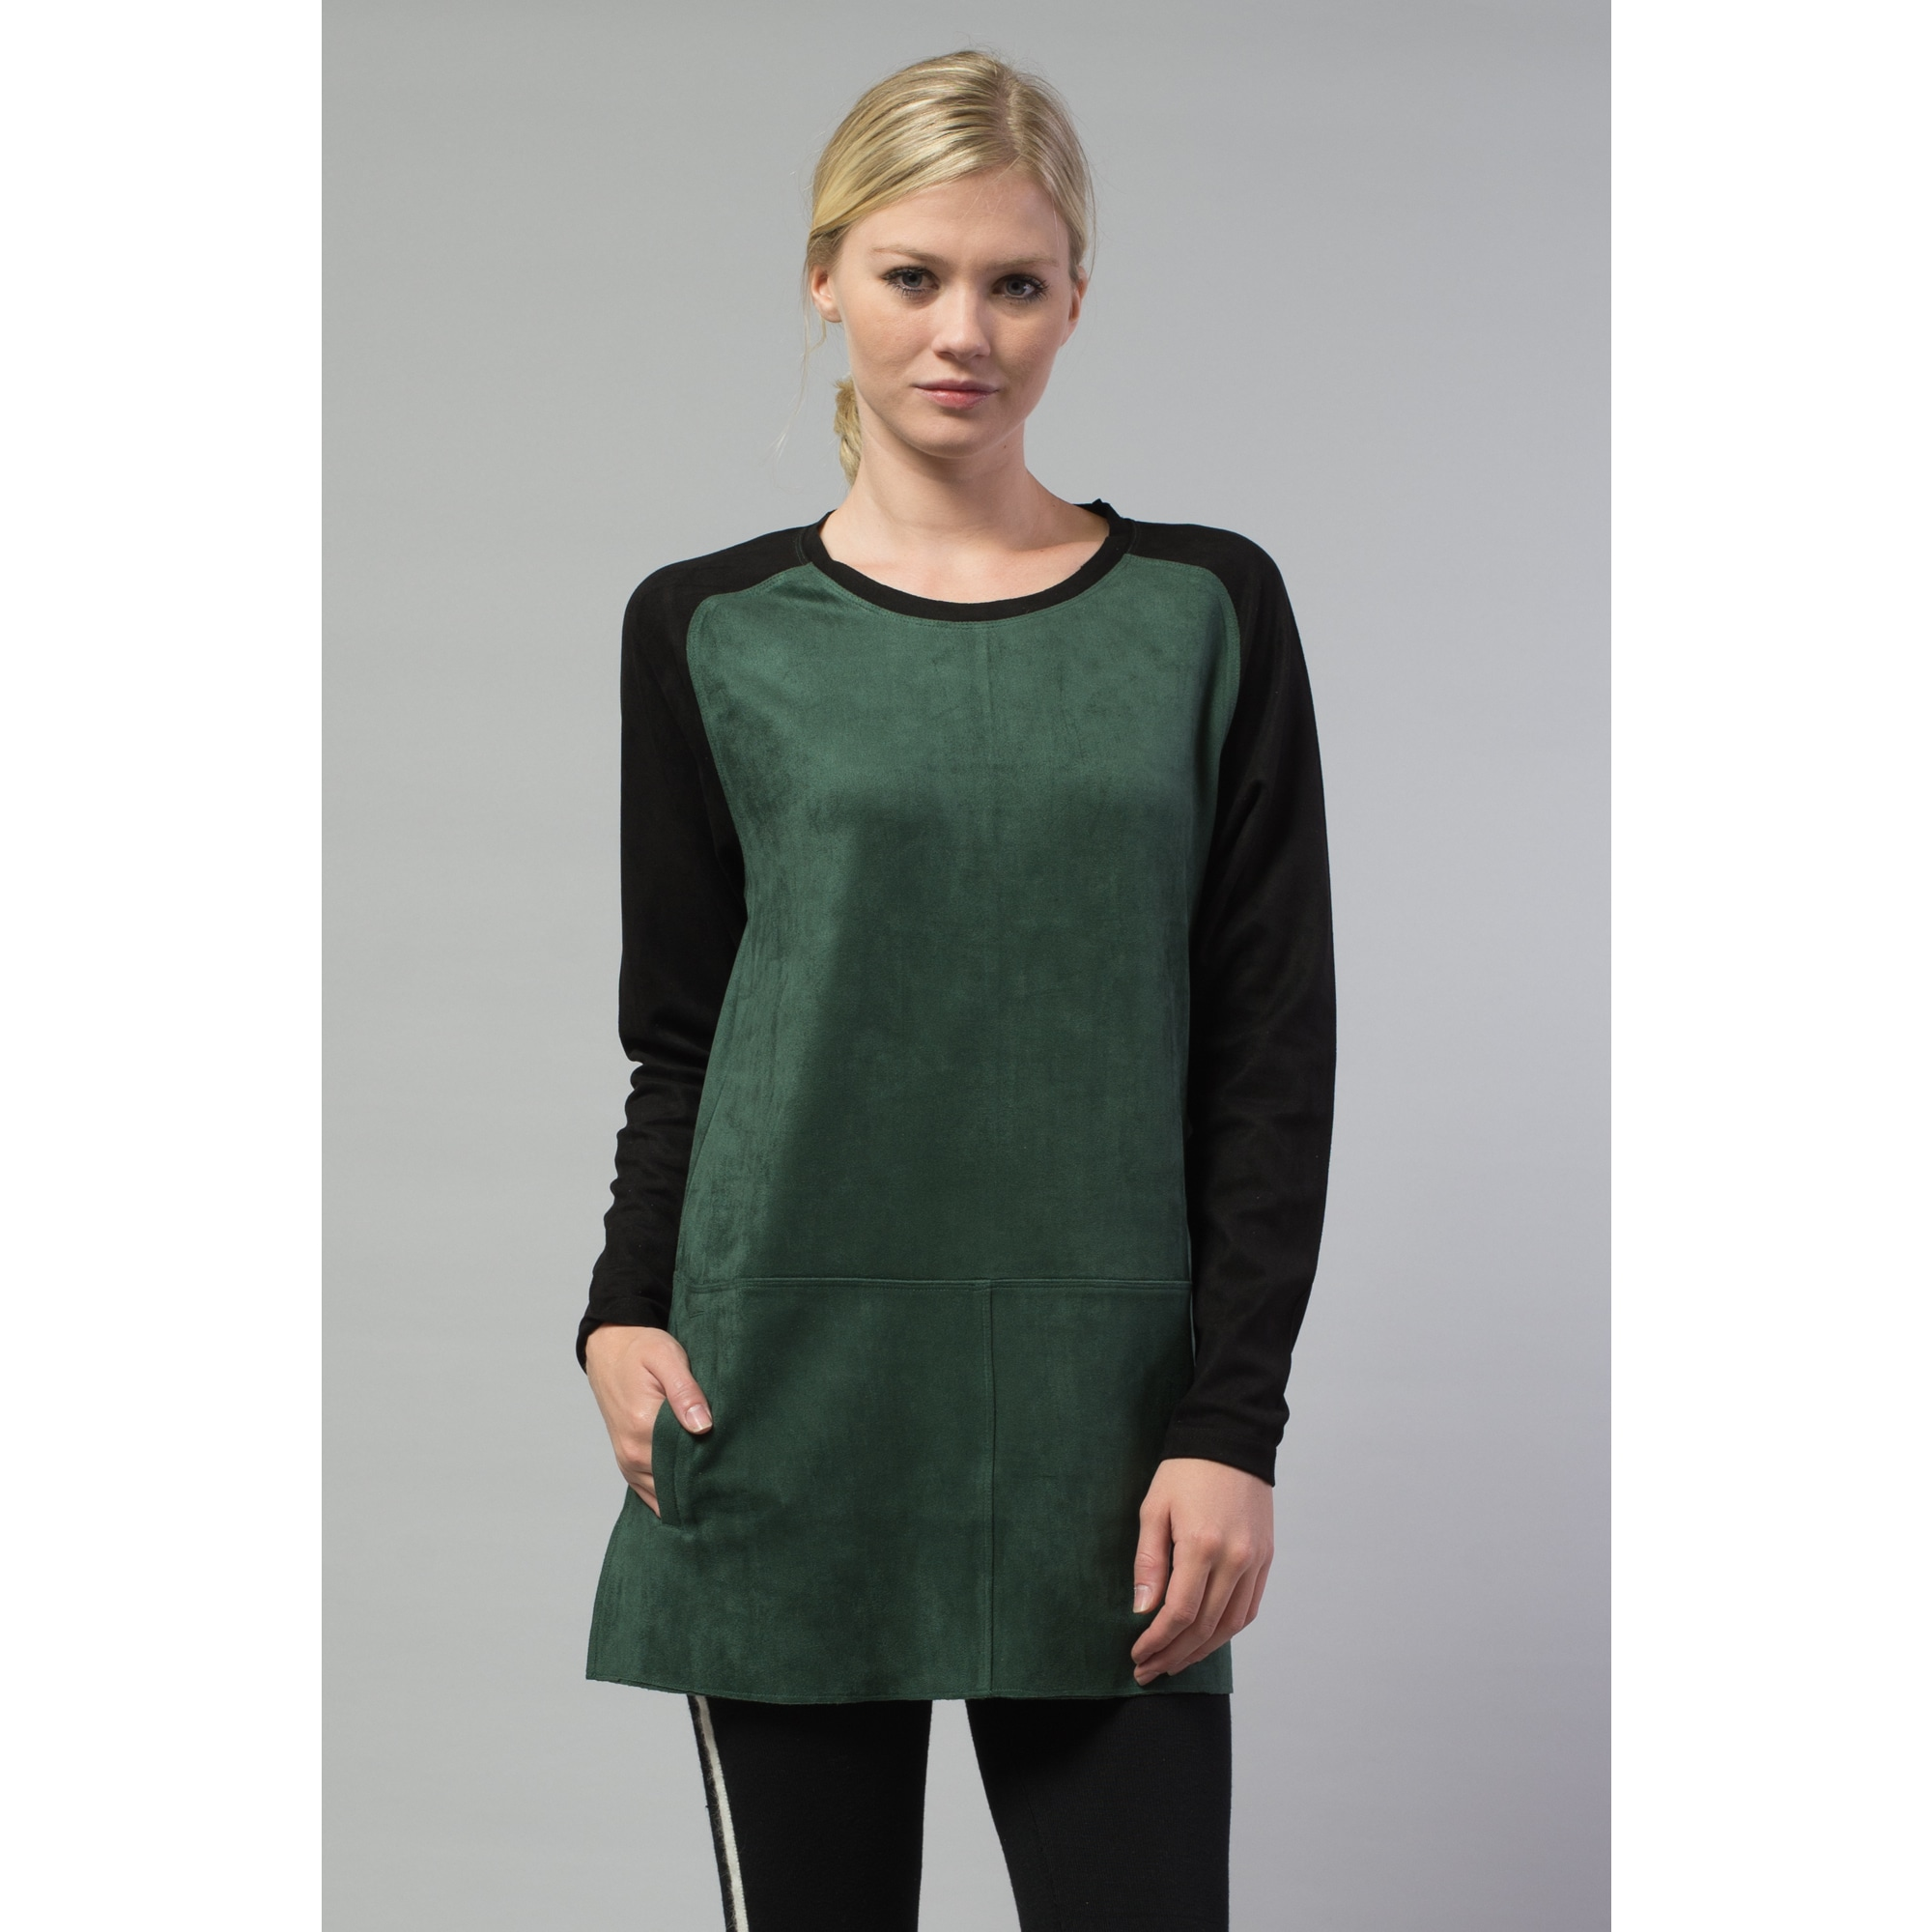 Morning Apple Women's Green Suede Color-block Top (Hunter...